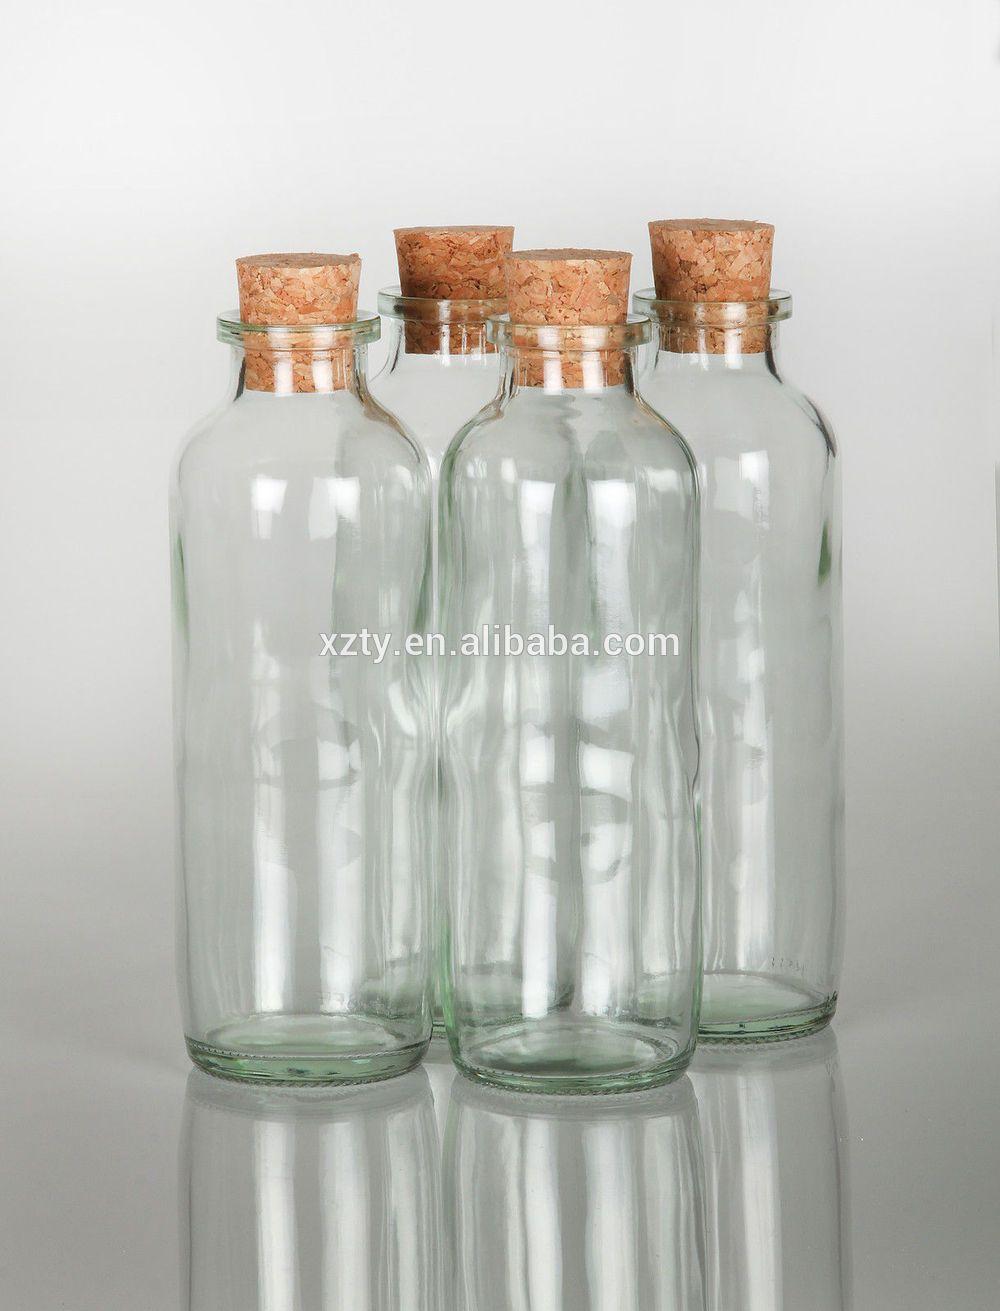 16oz Glass Cork Stopper Spice Oil Herb Storage Bottles Pots Jars